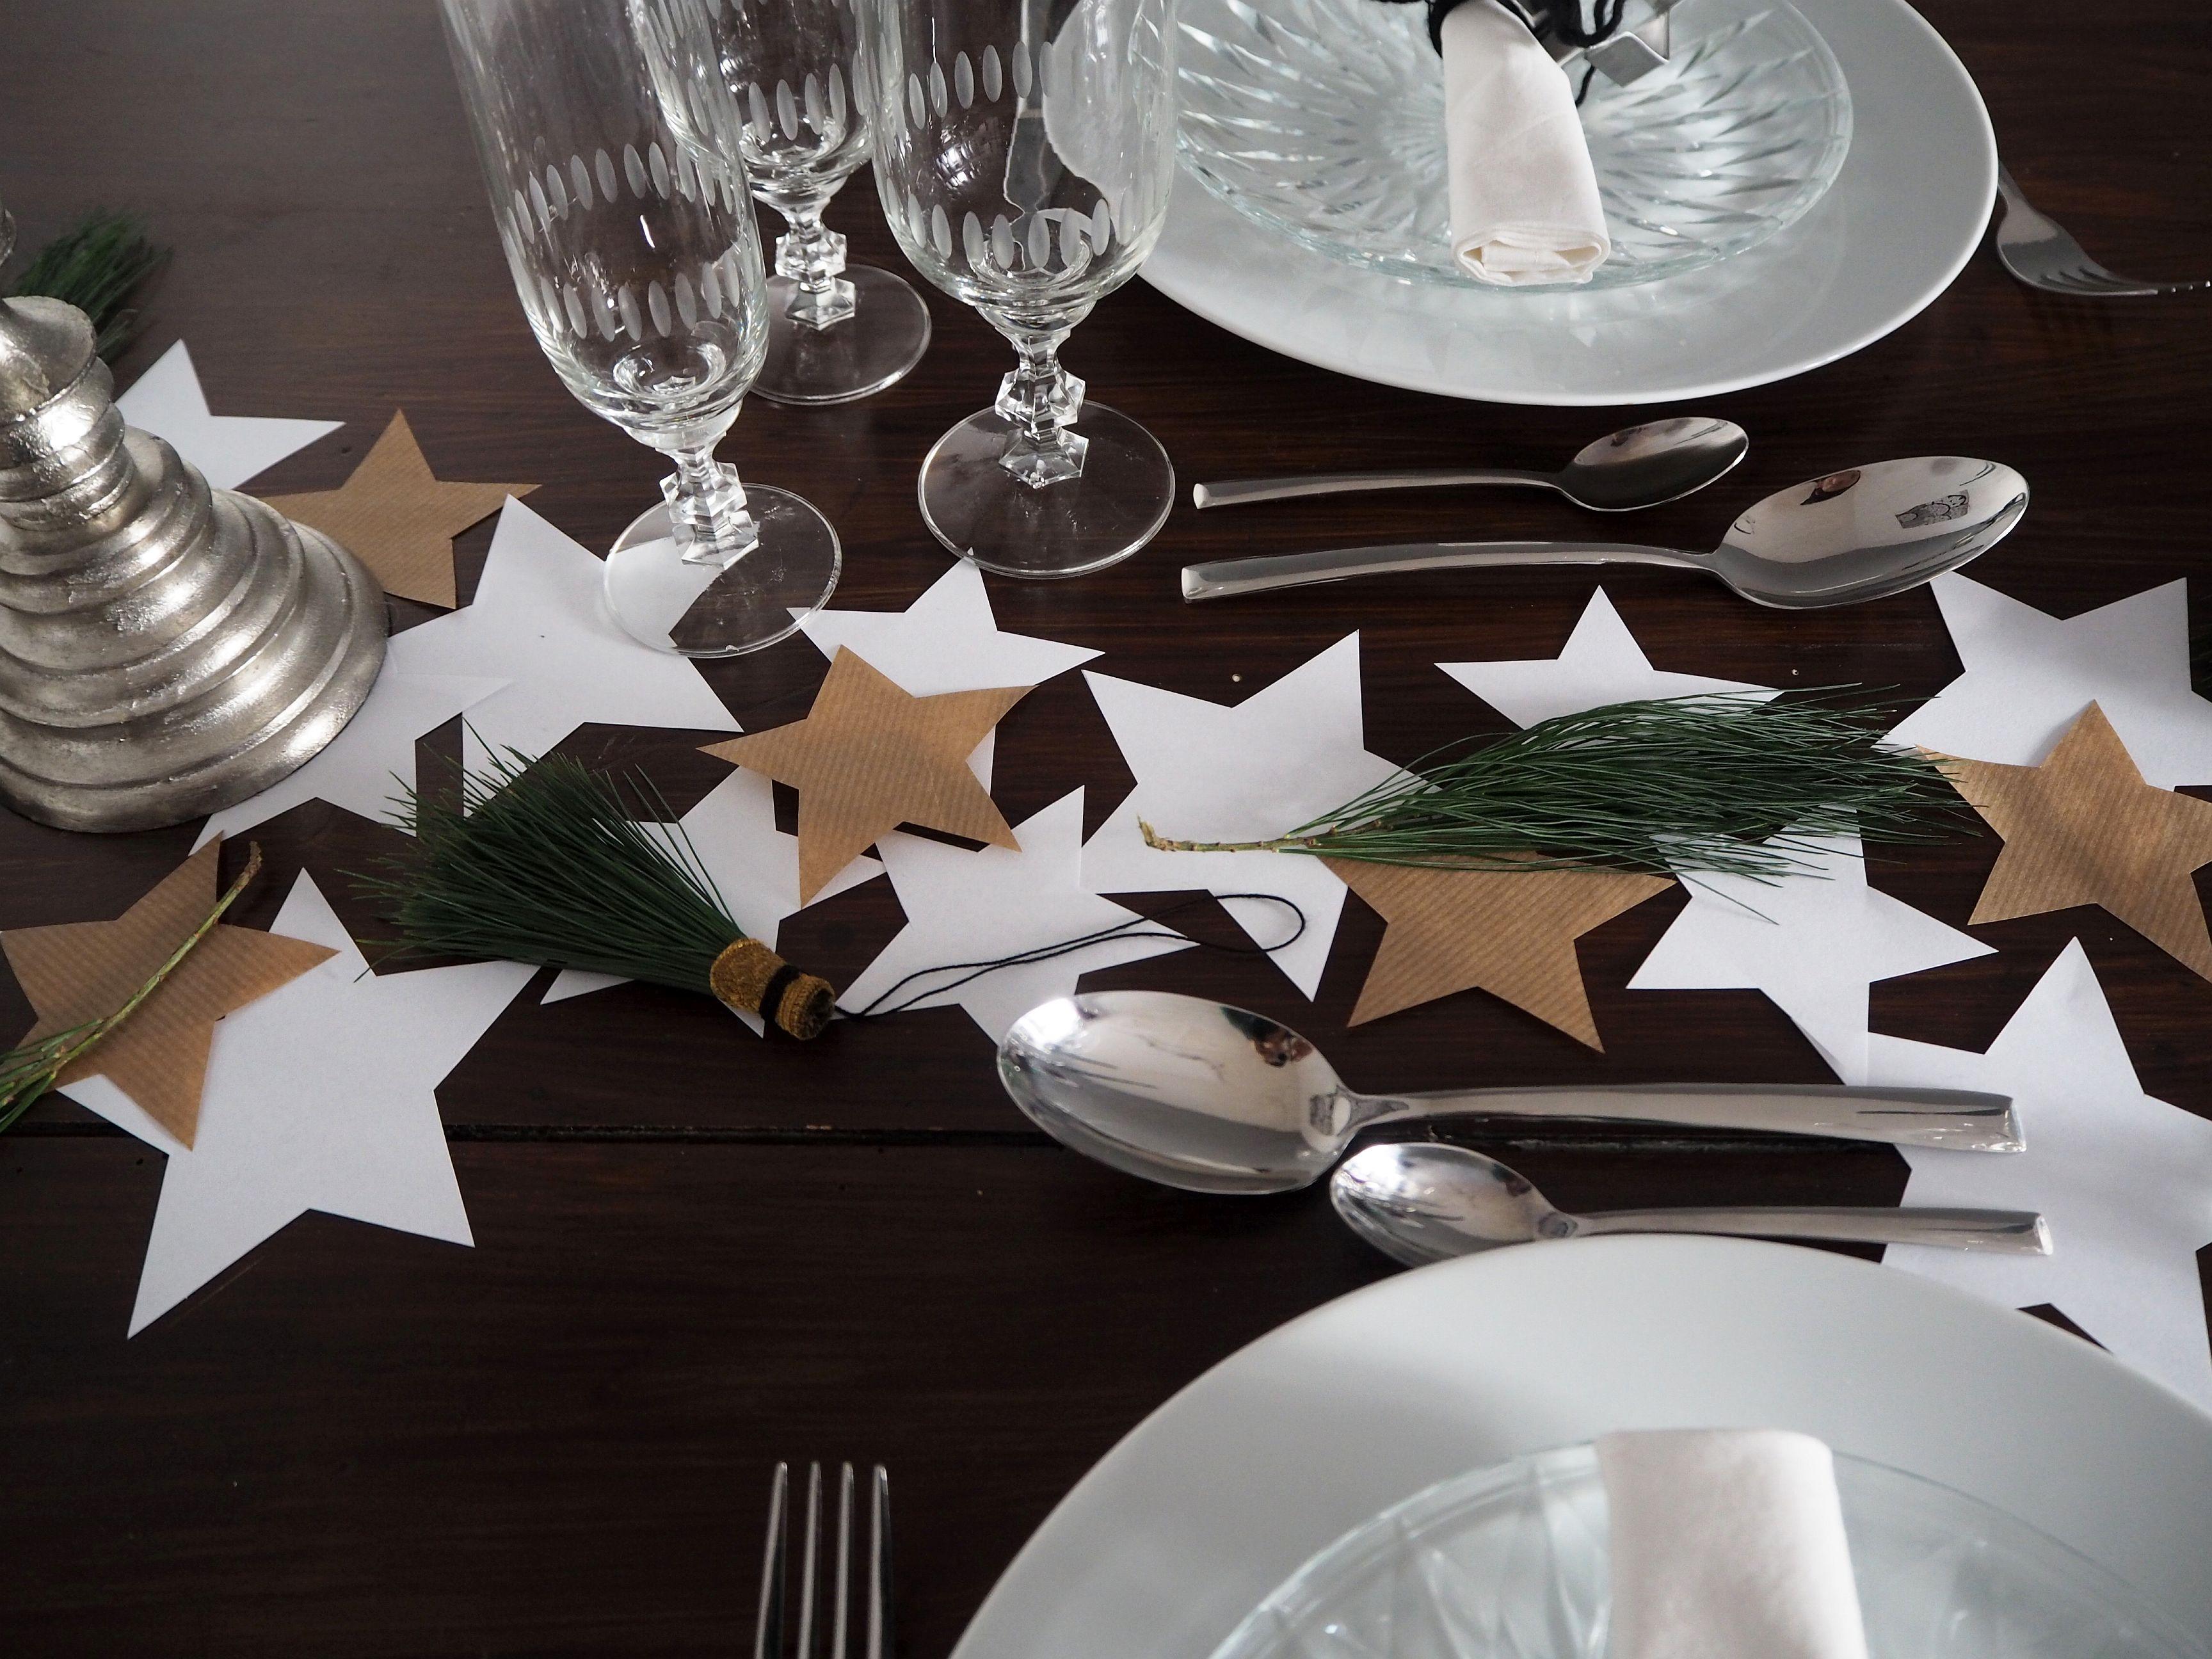 2016-12-skoen-och-kreativ-tischdeko-sternenhimmel-fuer-den-silvestertisch (11)